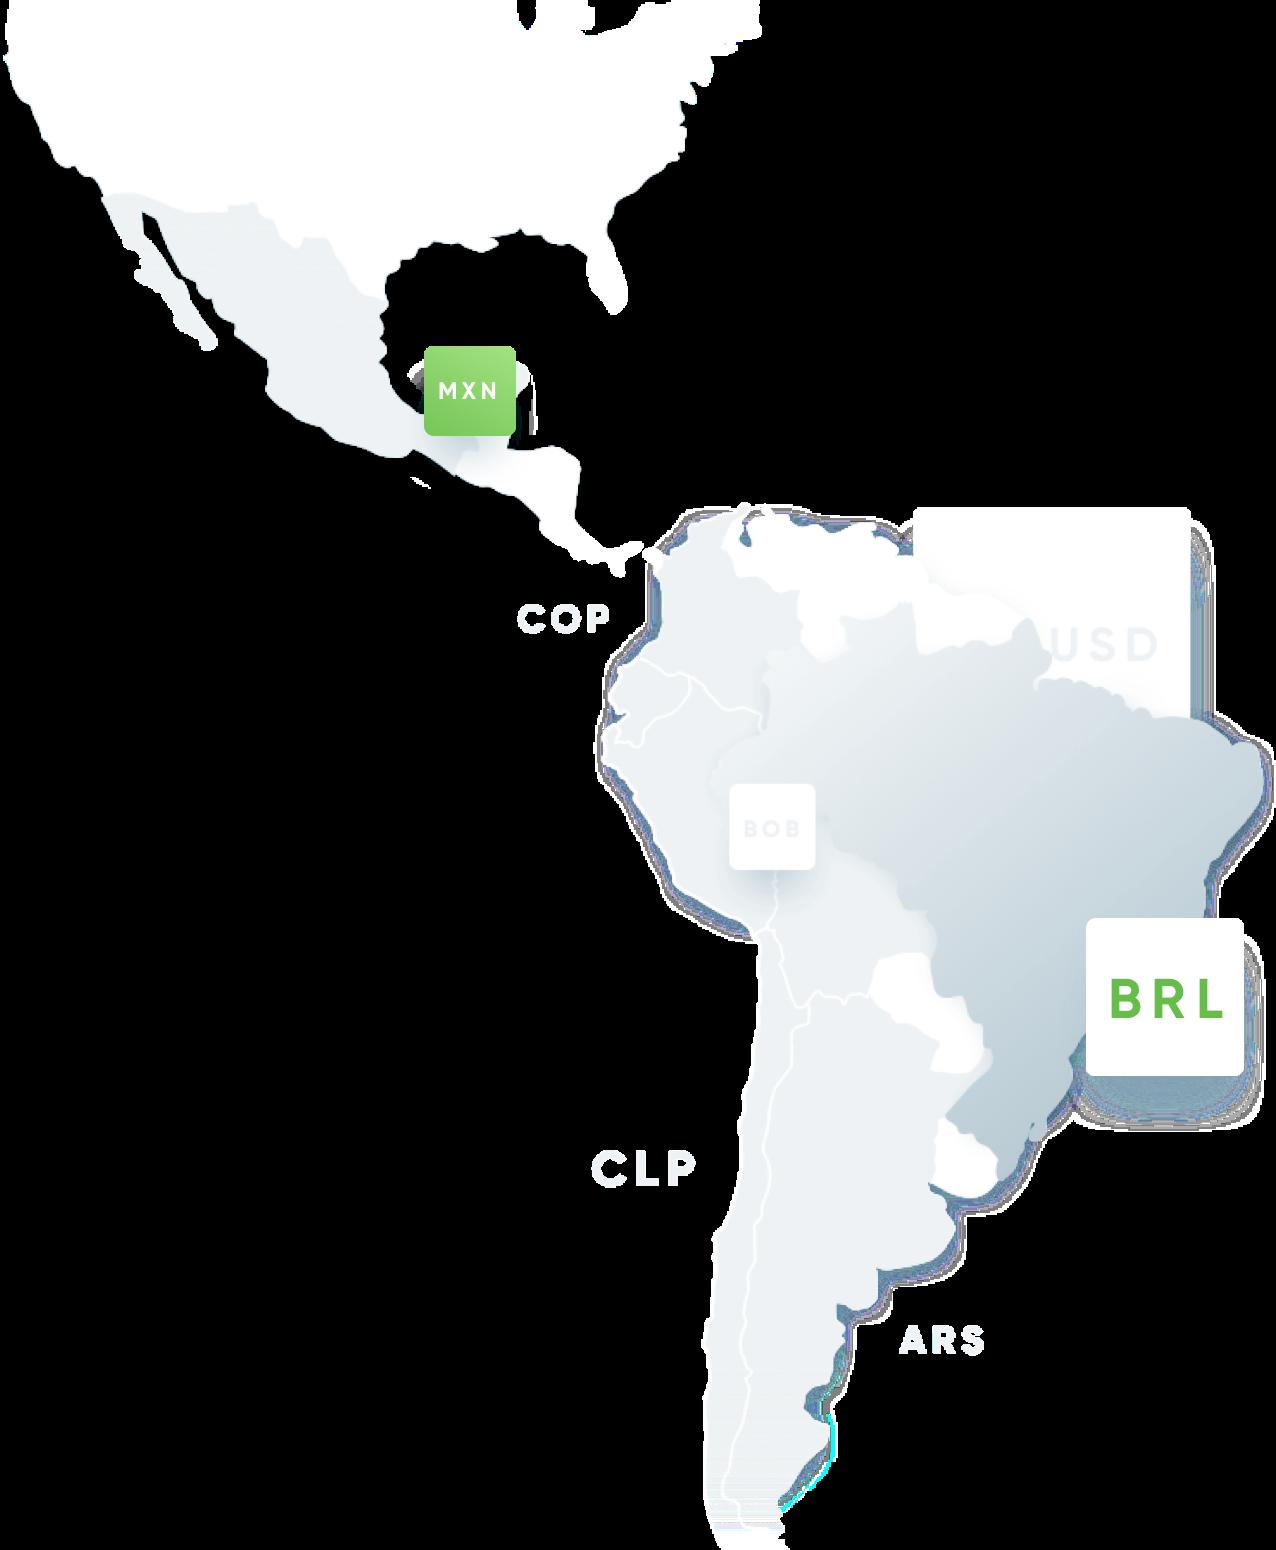 Conquer Latin America with EBANX